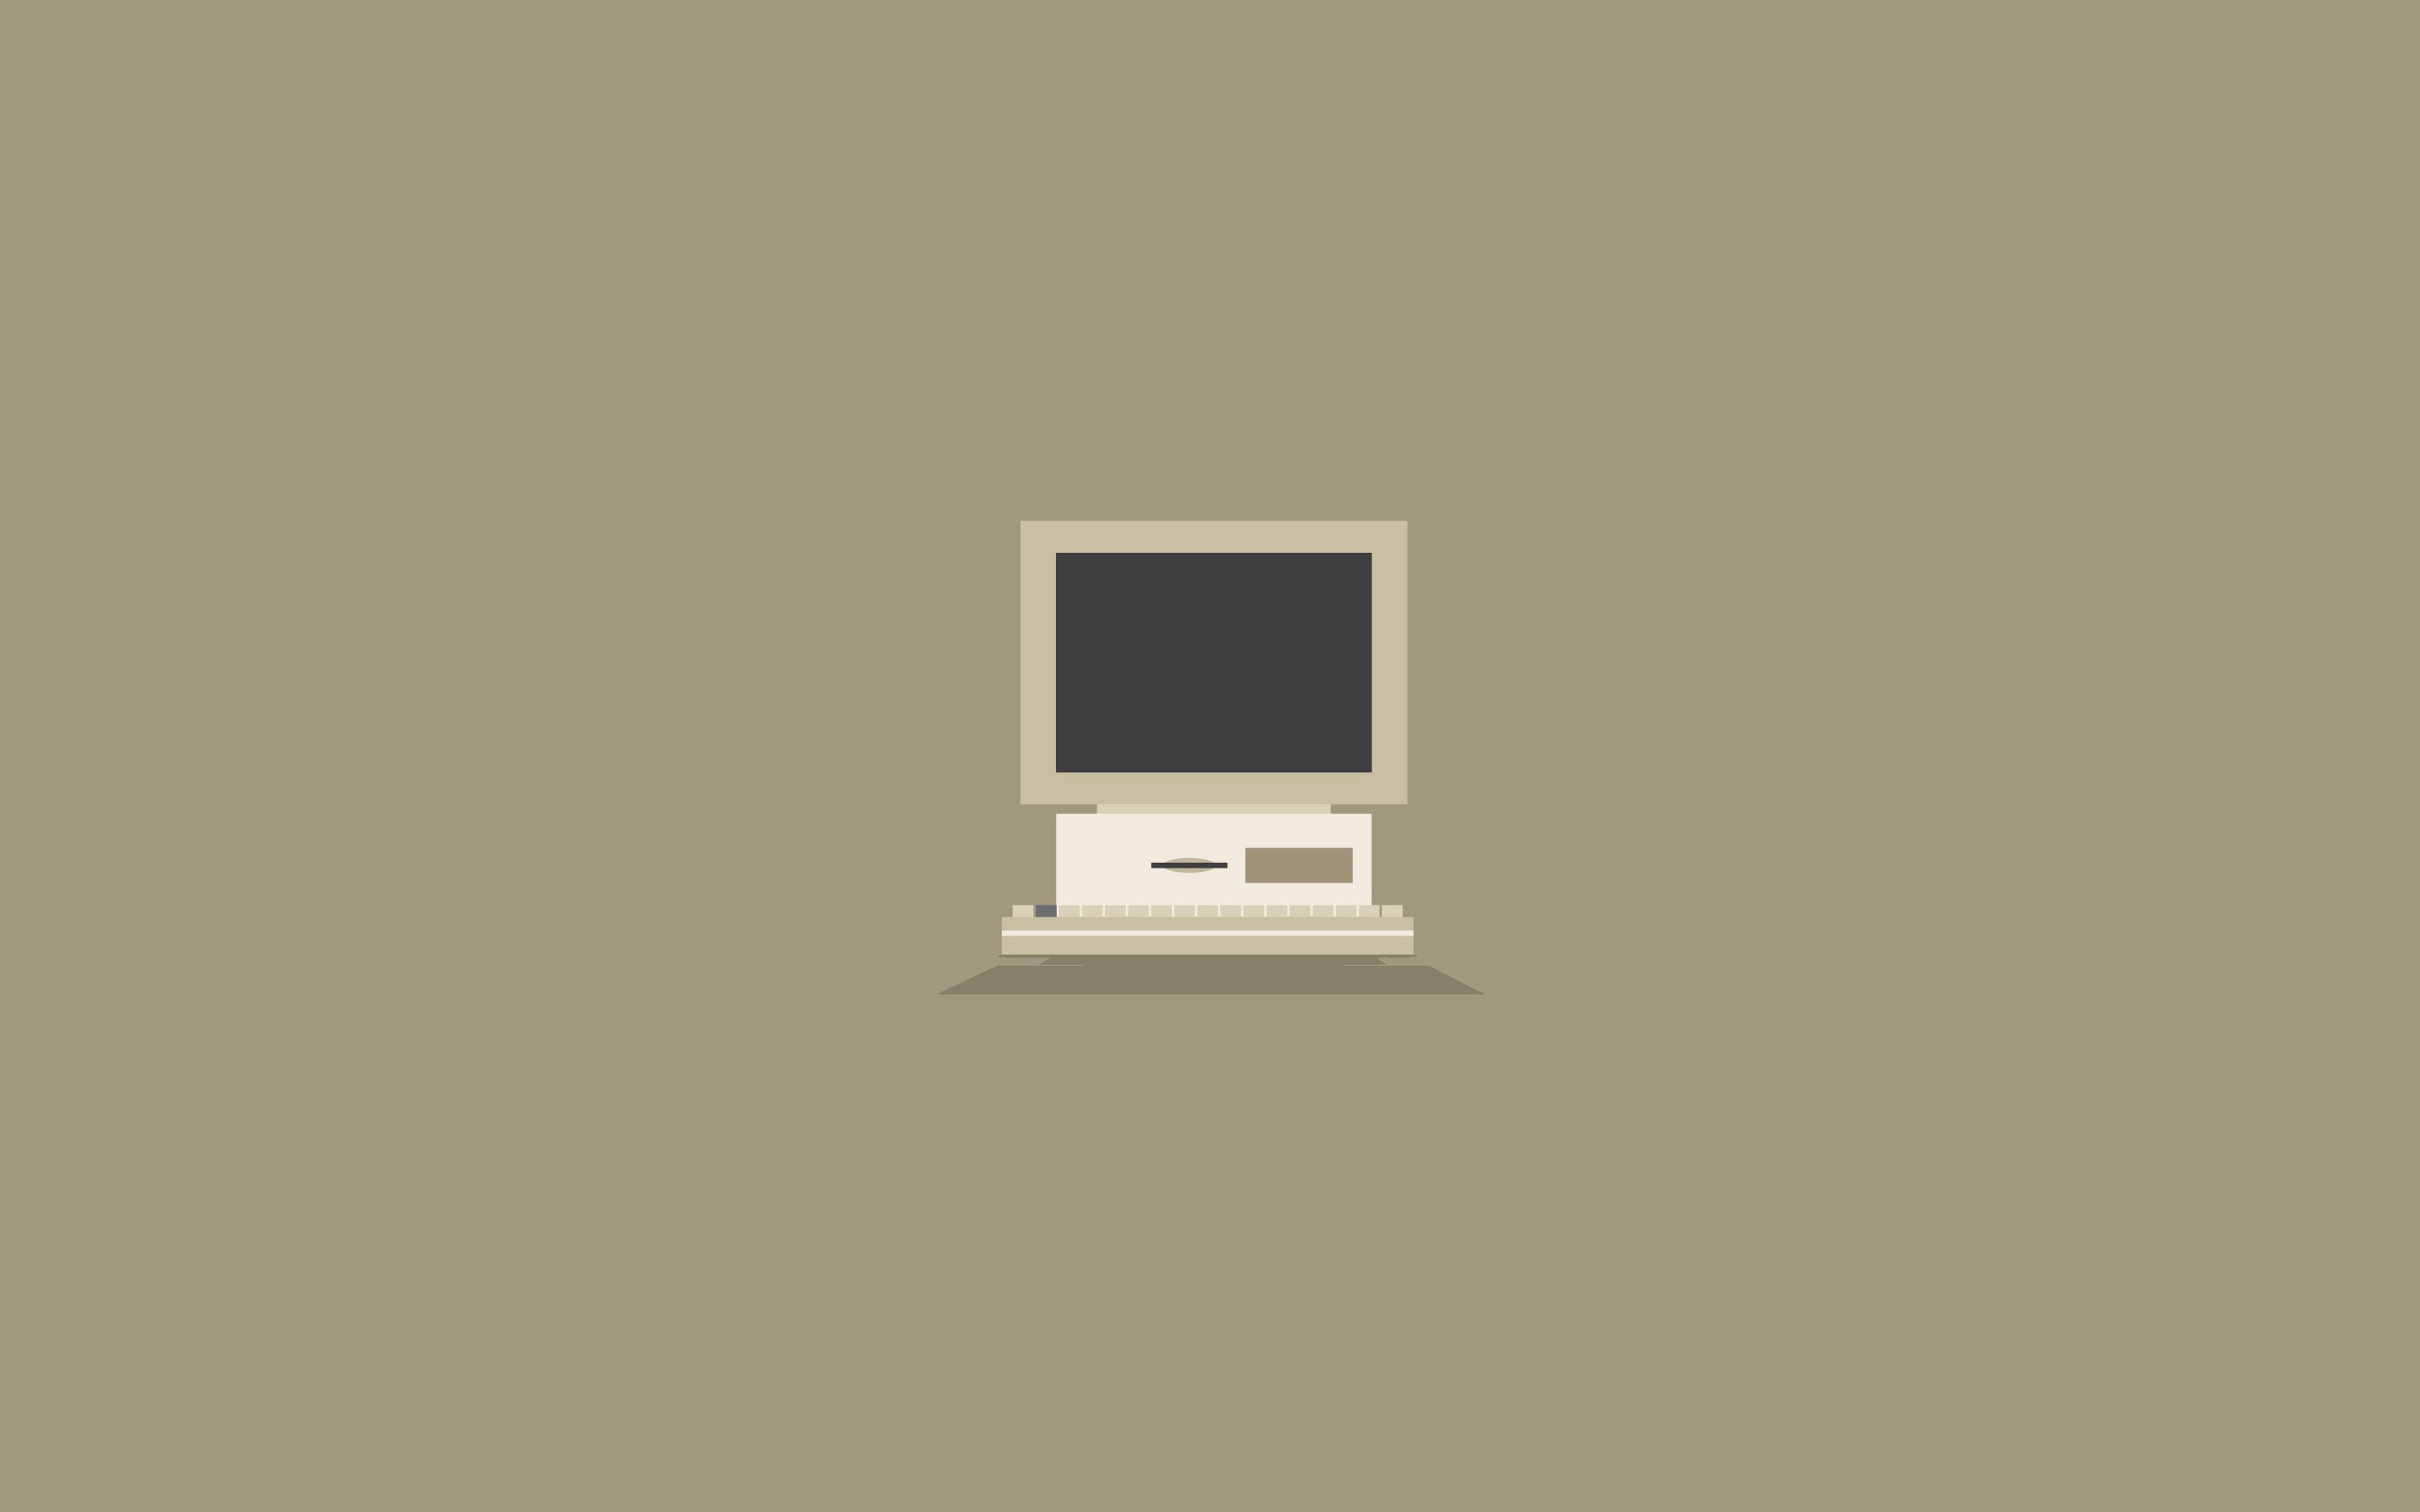 Computer Wallpaper Minimalist